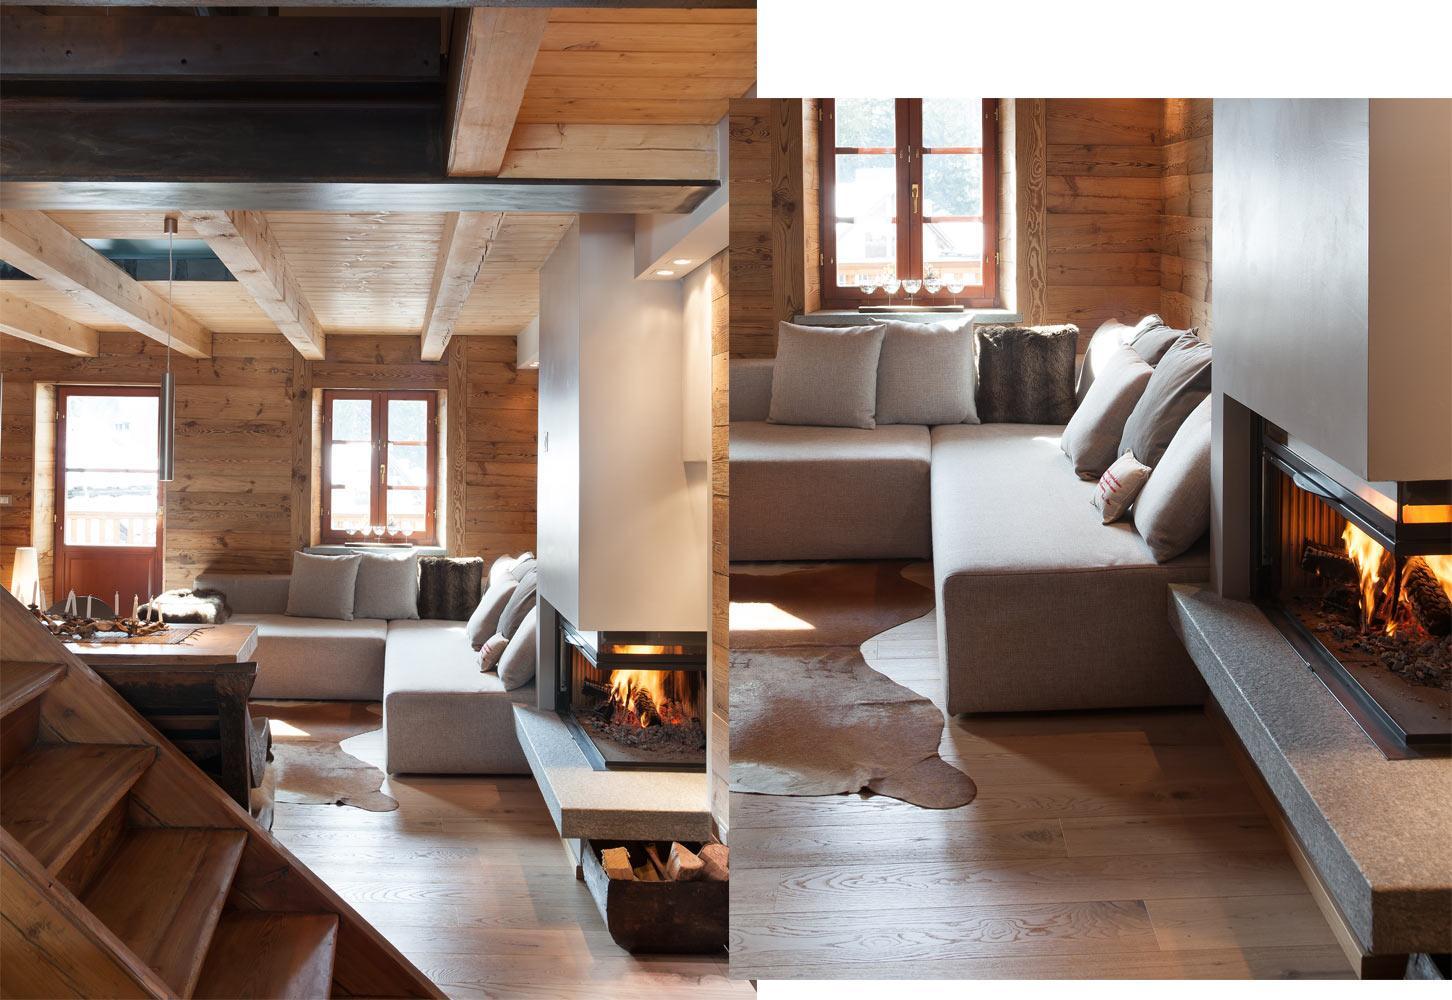 Chalet di design, Casa, Design, Stile, Arredamento, Chalet